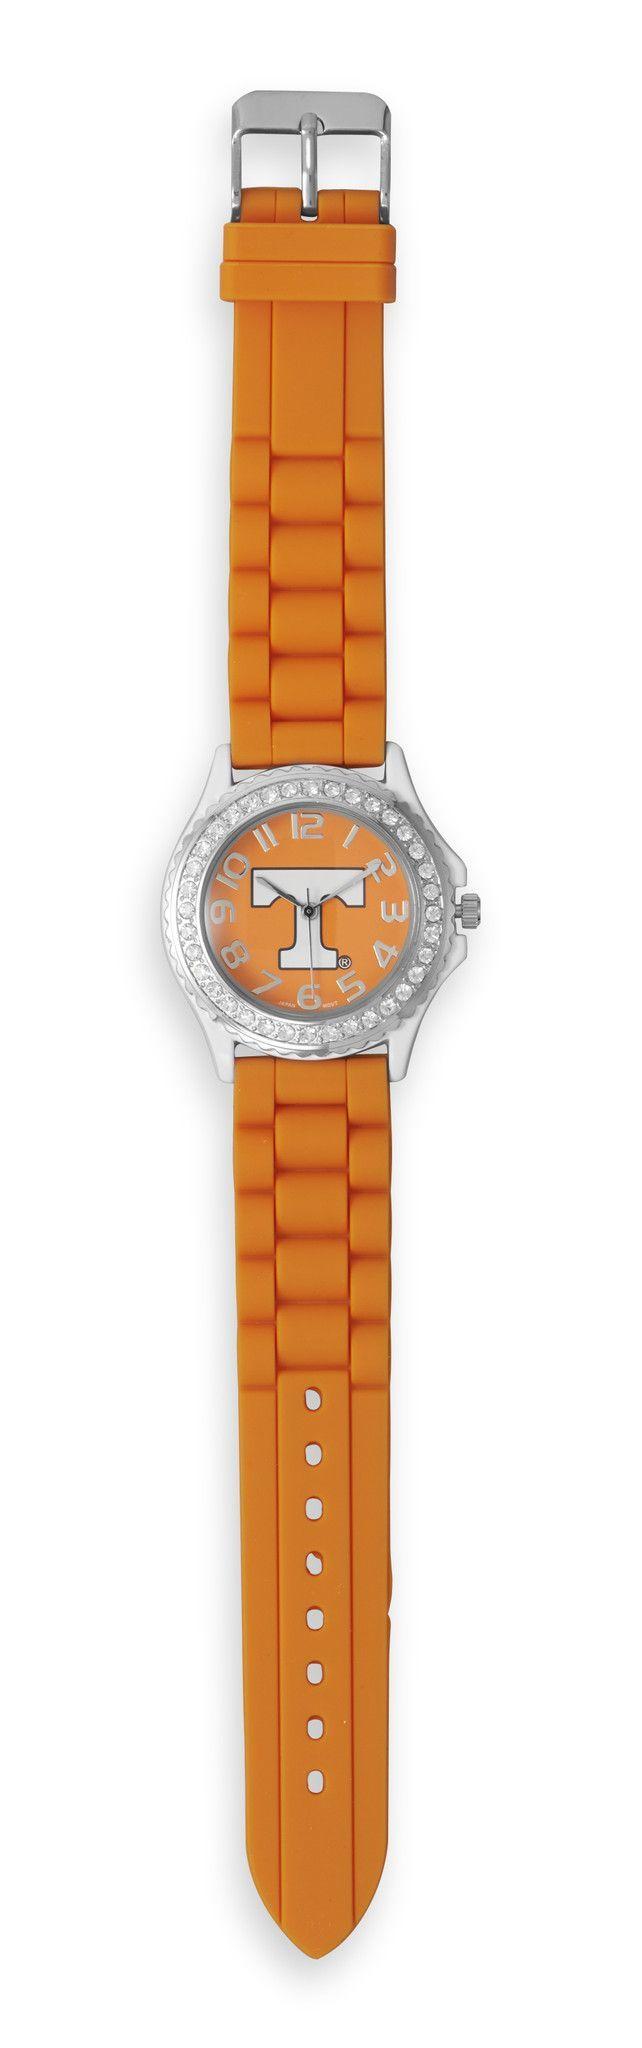 Collegiate Licensed University of Tennessee Ladies' Fashion Watch